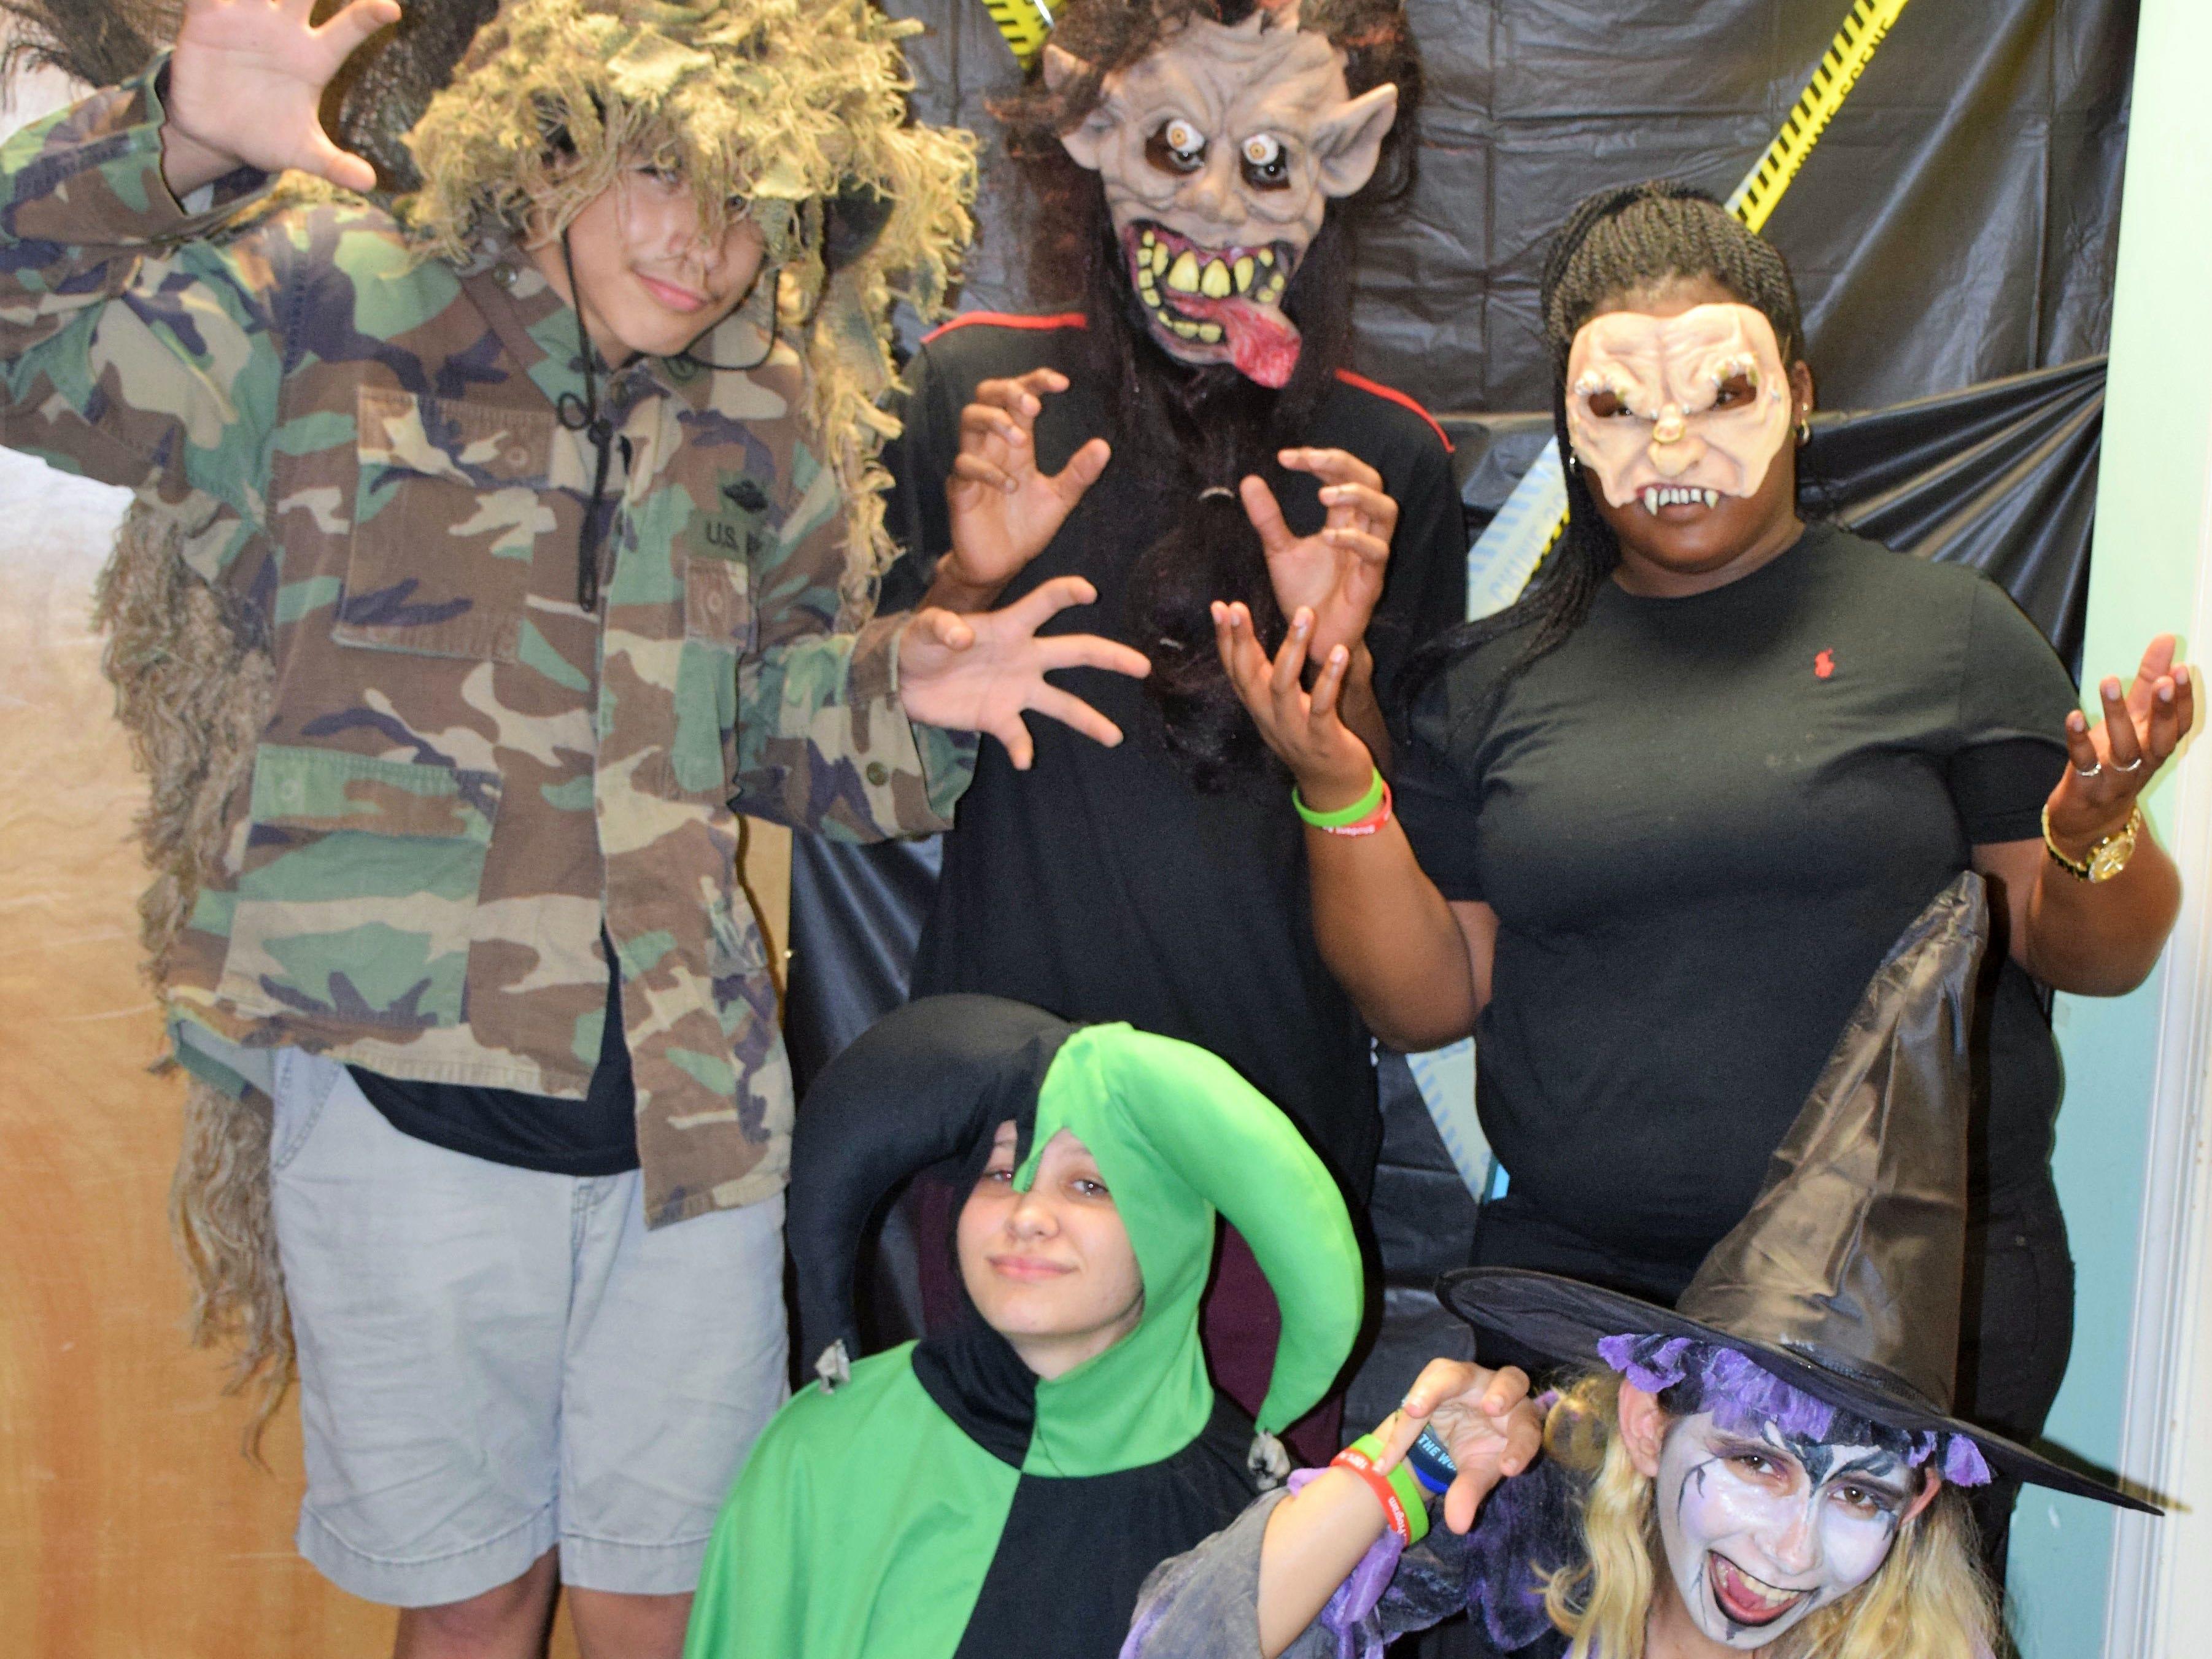 Pathfinder president Jessie, 17; Cameron, 17; Atalia, 14; Tatiana, 14 and John, 17.